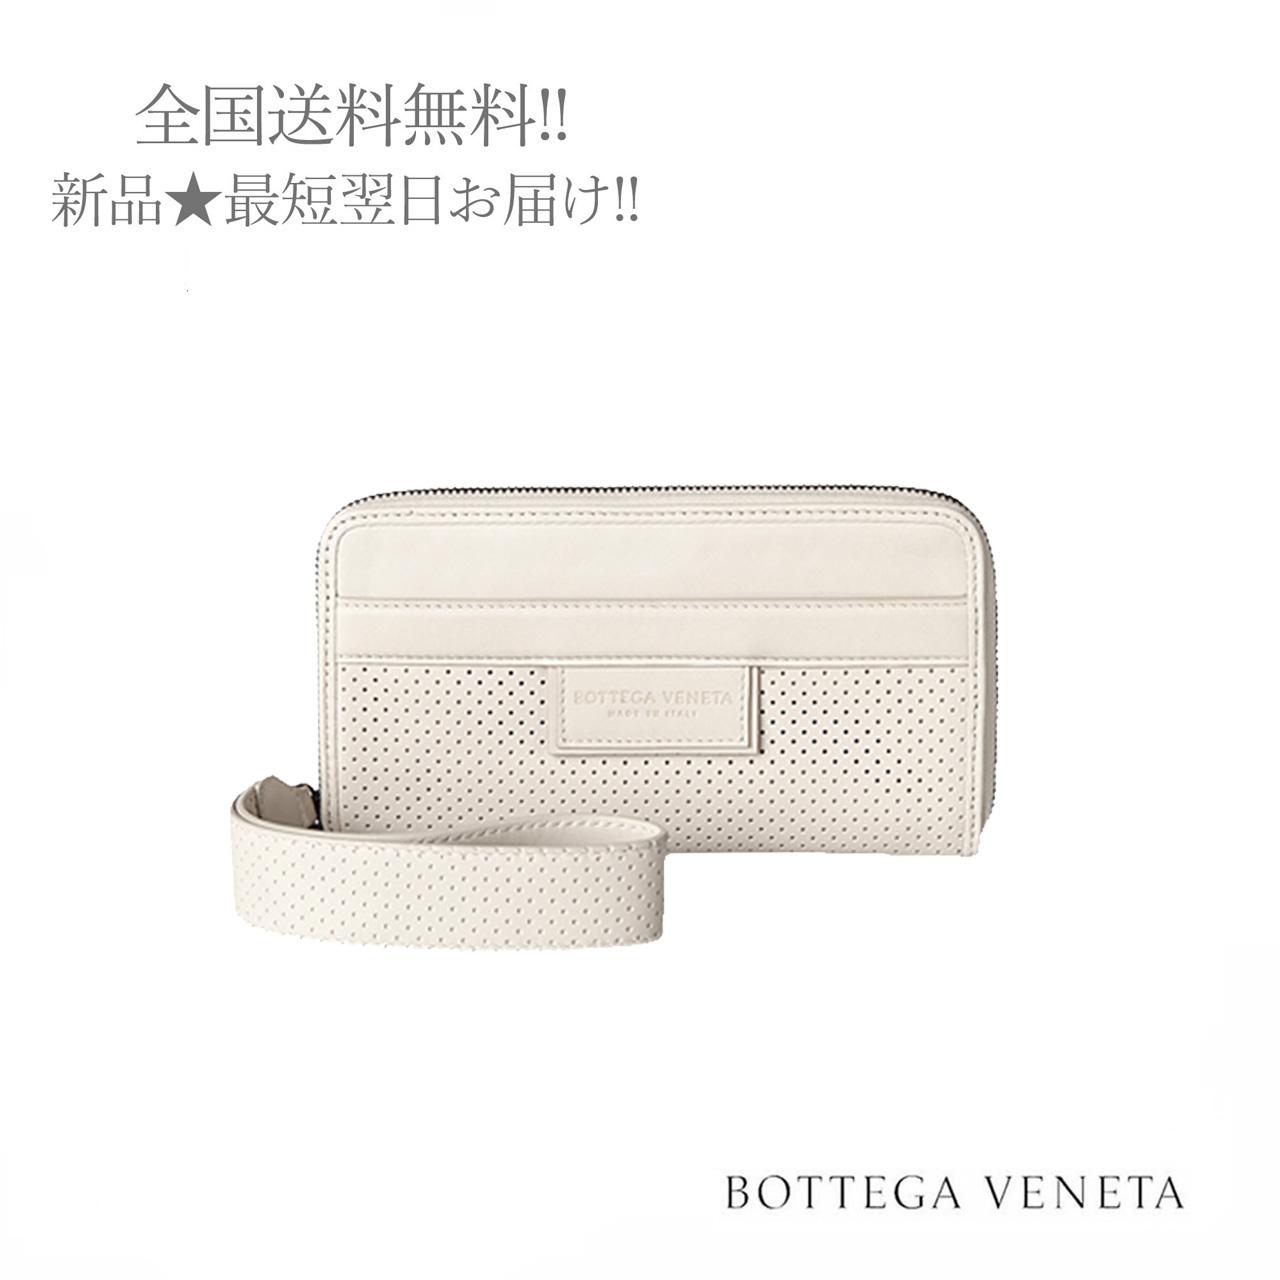 BOTTEGA お金を節約 VENETA ボッテガ ヴェネタ 長財布 ジップアラウンドウォレット ハンドストラップ付 1909 付与 ミスト 女 レディース 新品 イタリア製